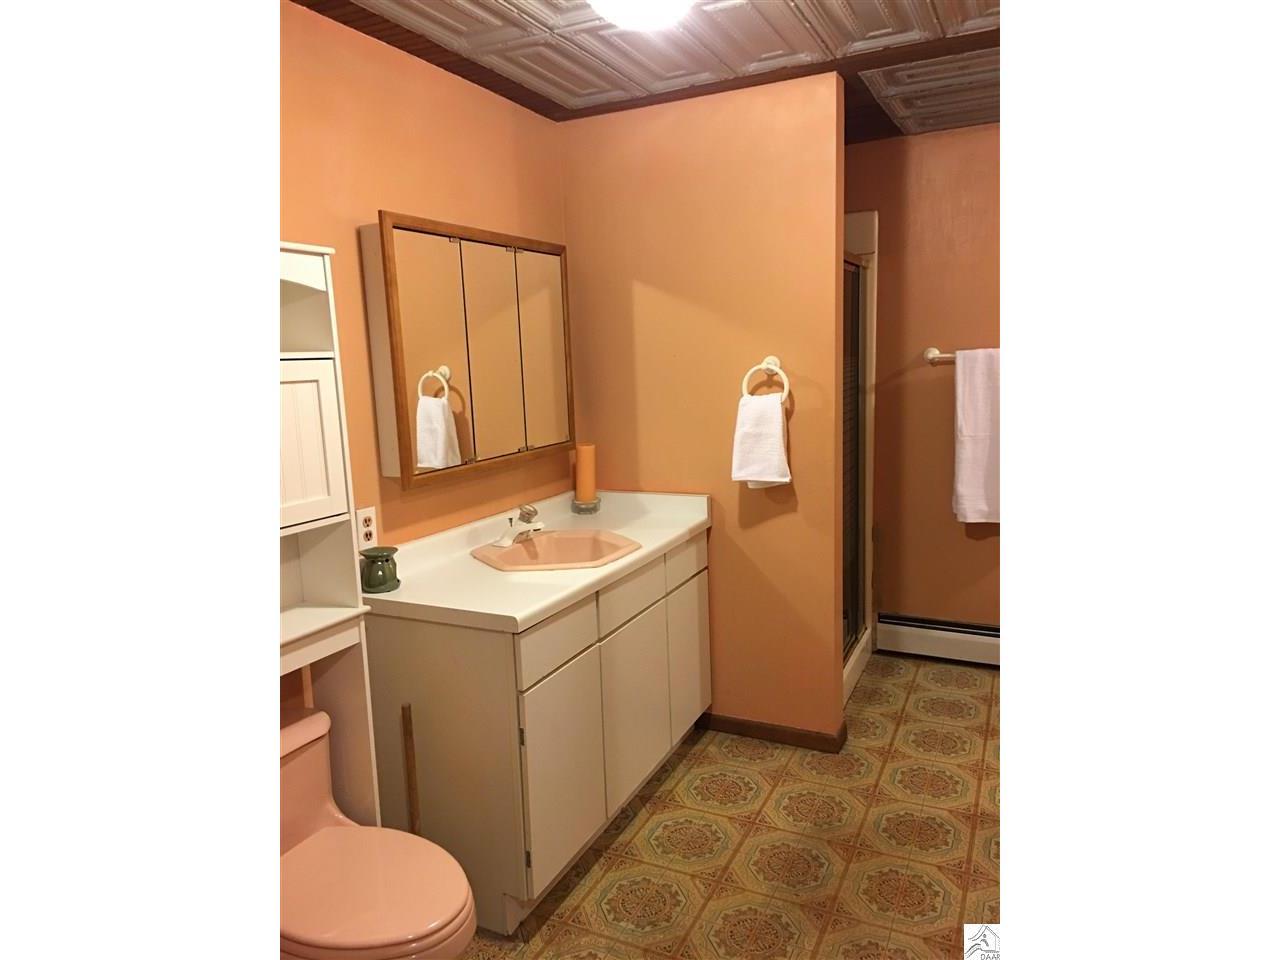 Bath 3 of 3 has a shower as well as a sauna